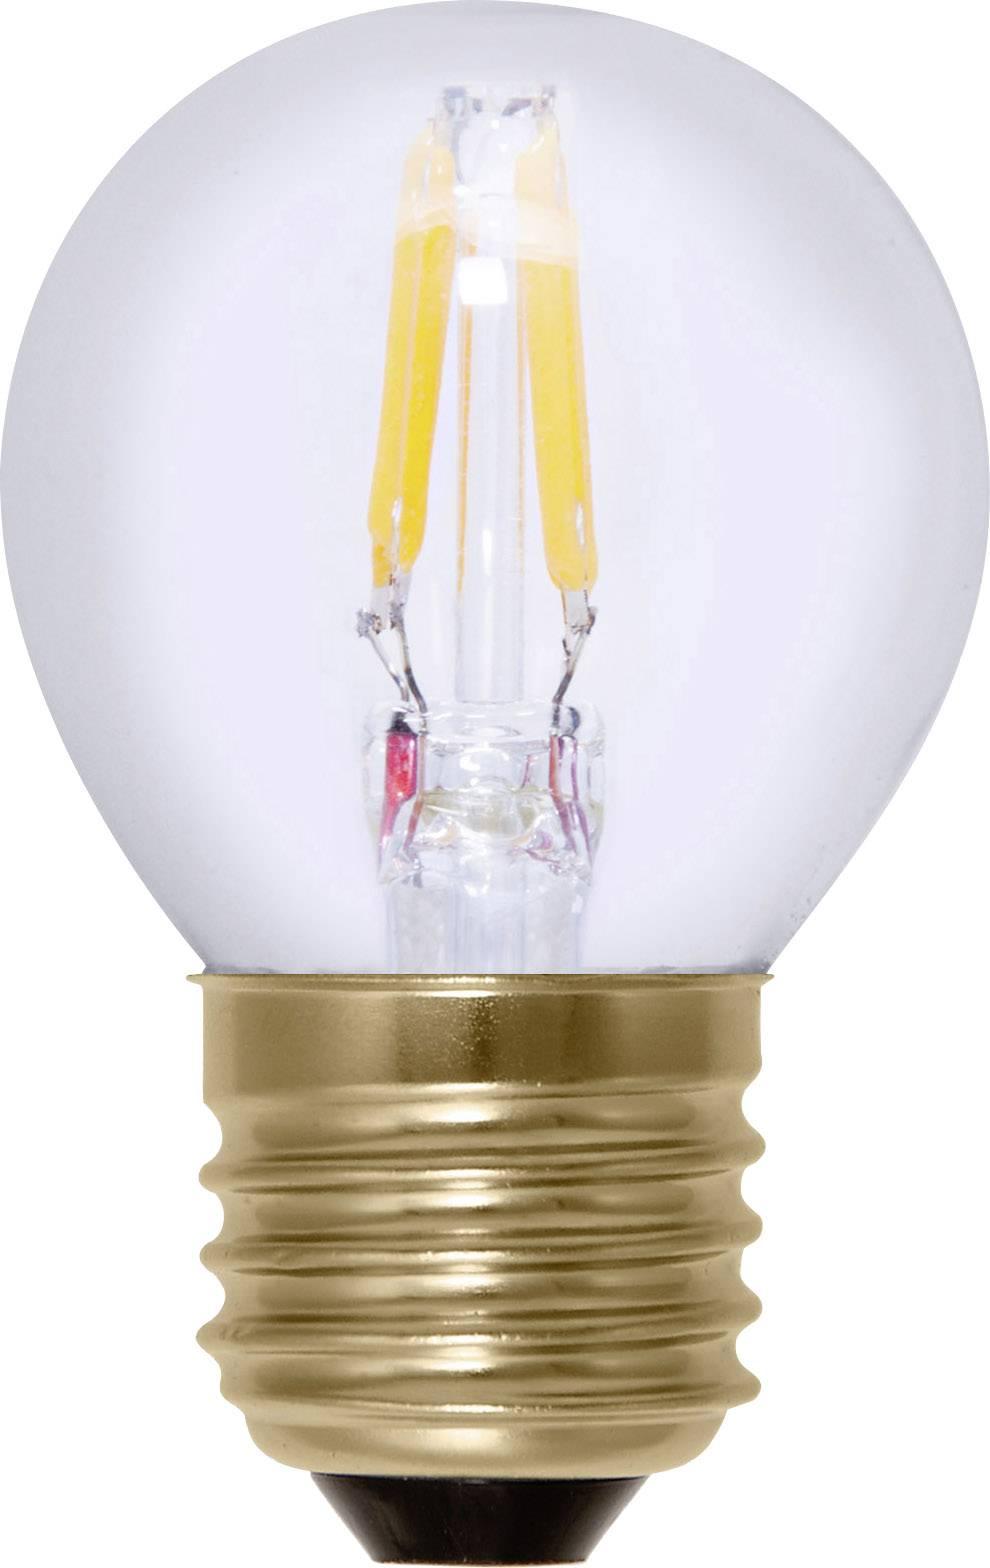 Led Lampen Kruidvat : ▷ kruidvat led verlichting kopen online internetwinkel